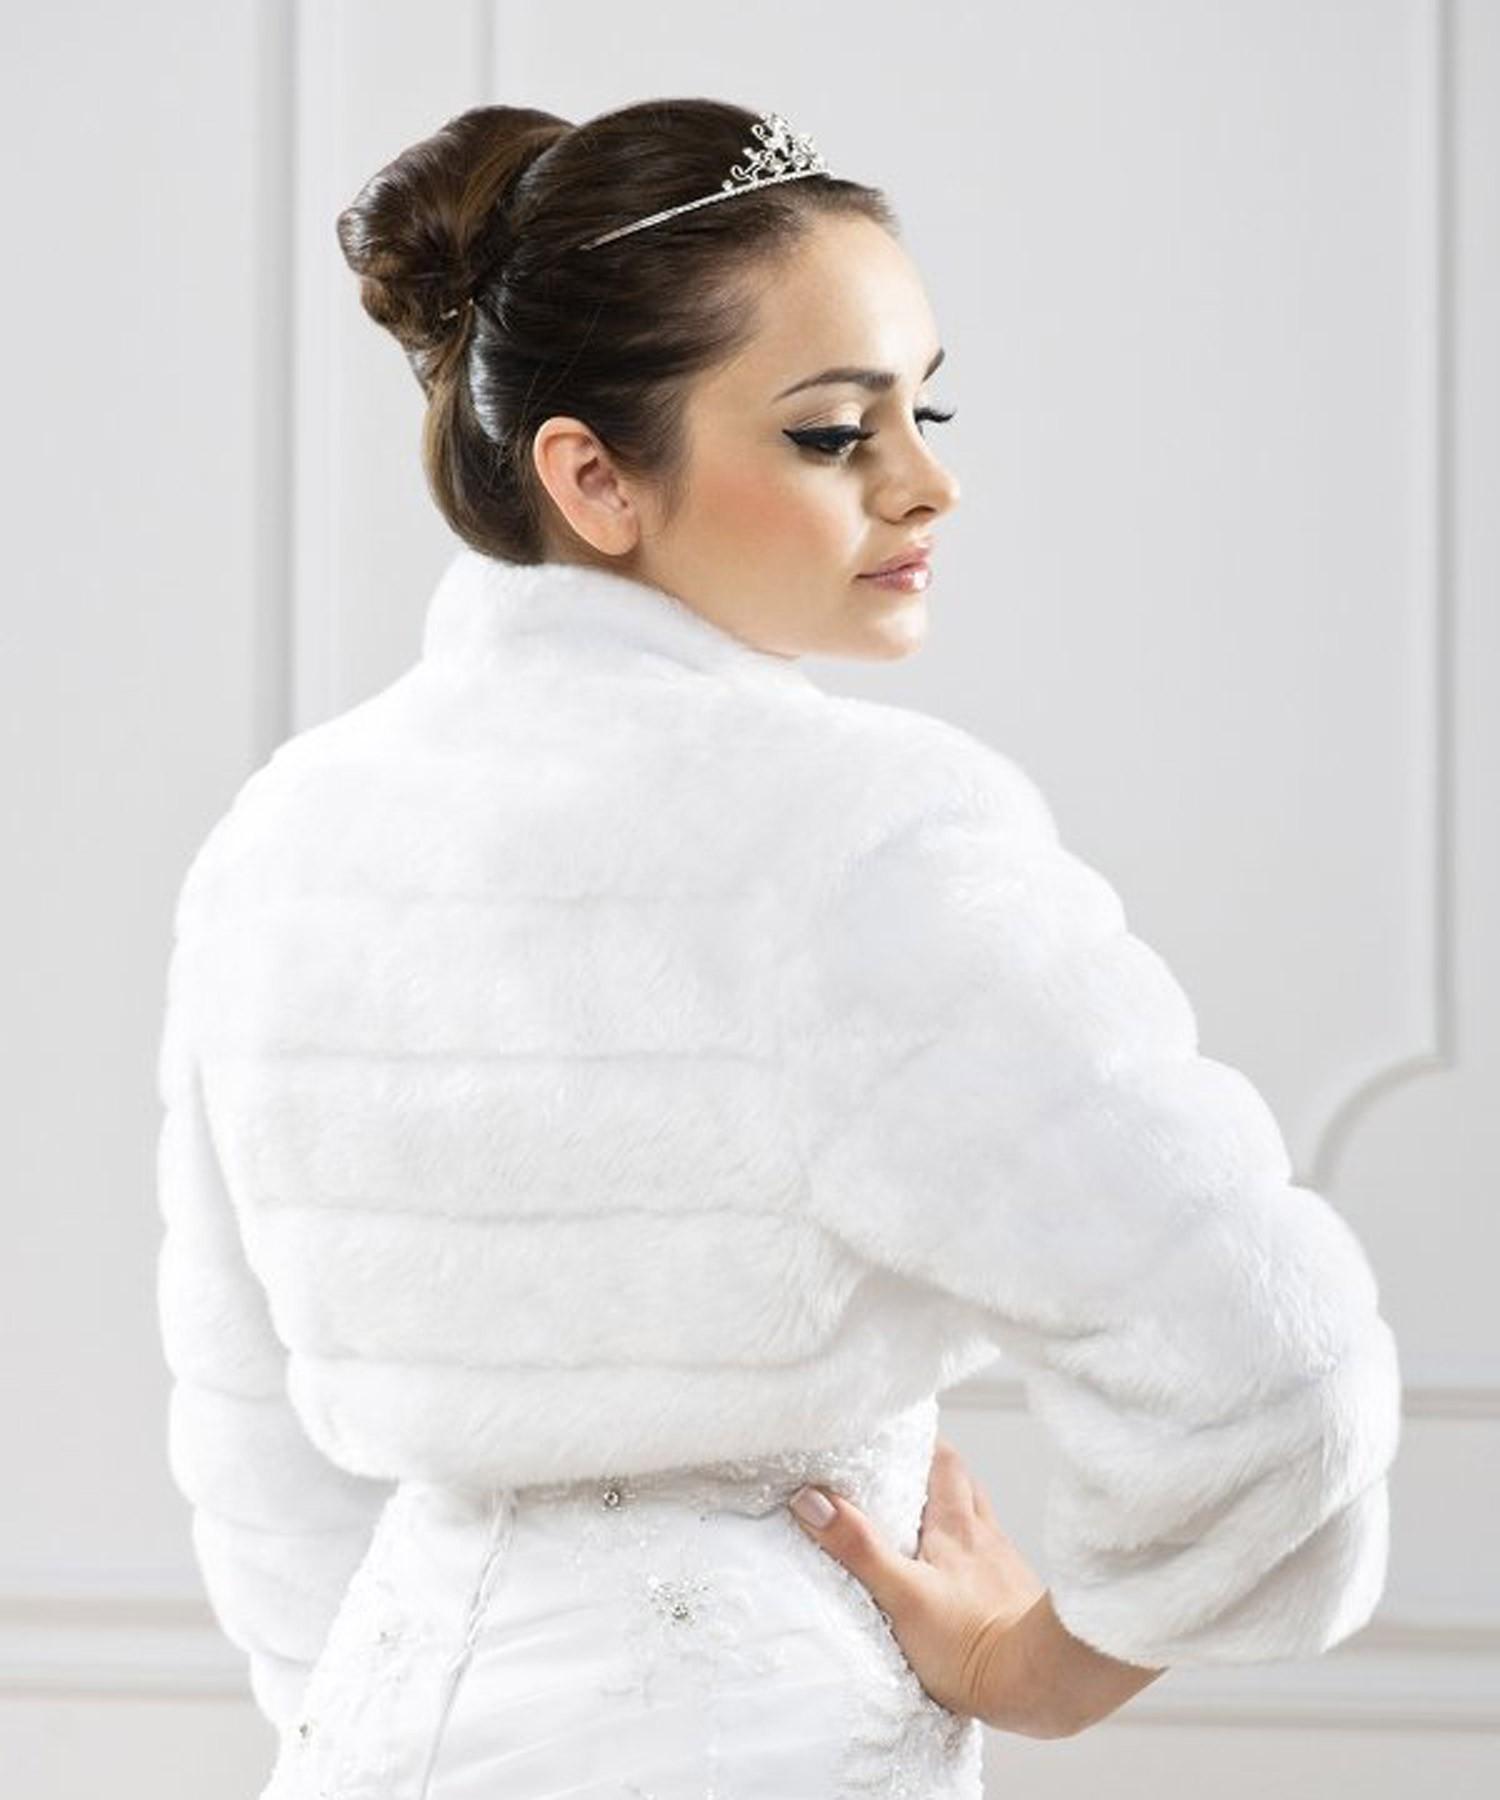 bolro marie fourrure blanc tania - Bolero Fourrure Mariage